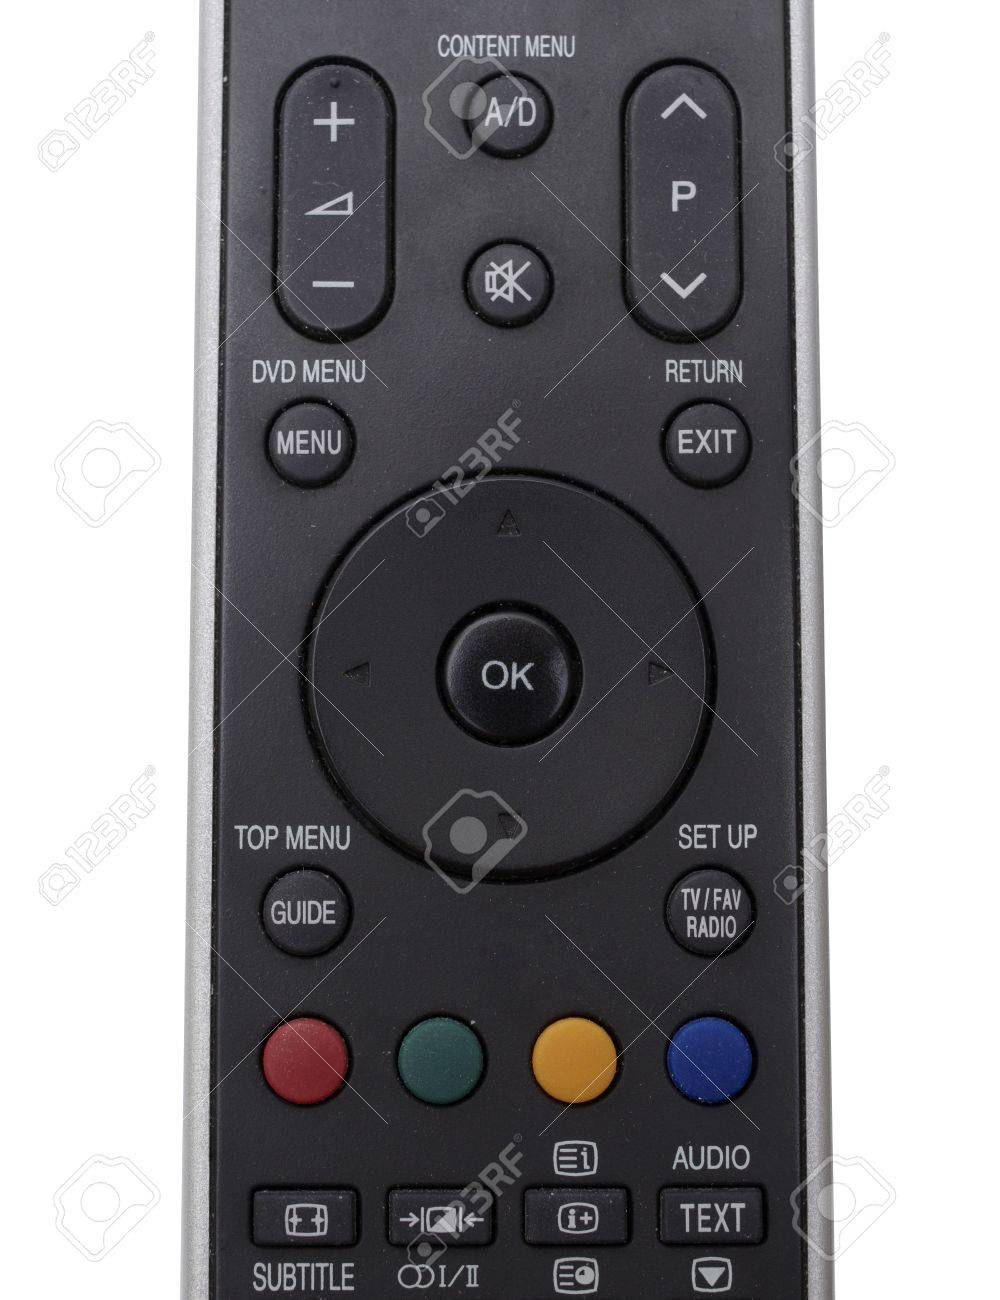 Black Tv Telecommande Pres De La Vue De Dessus Banque D Images Et